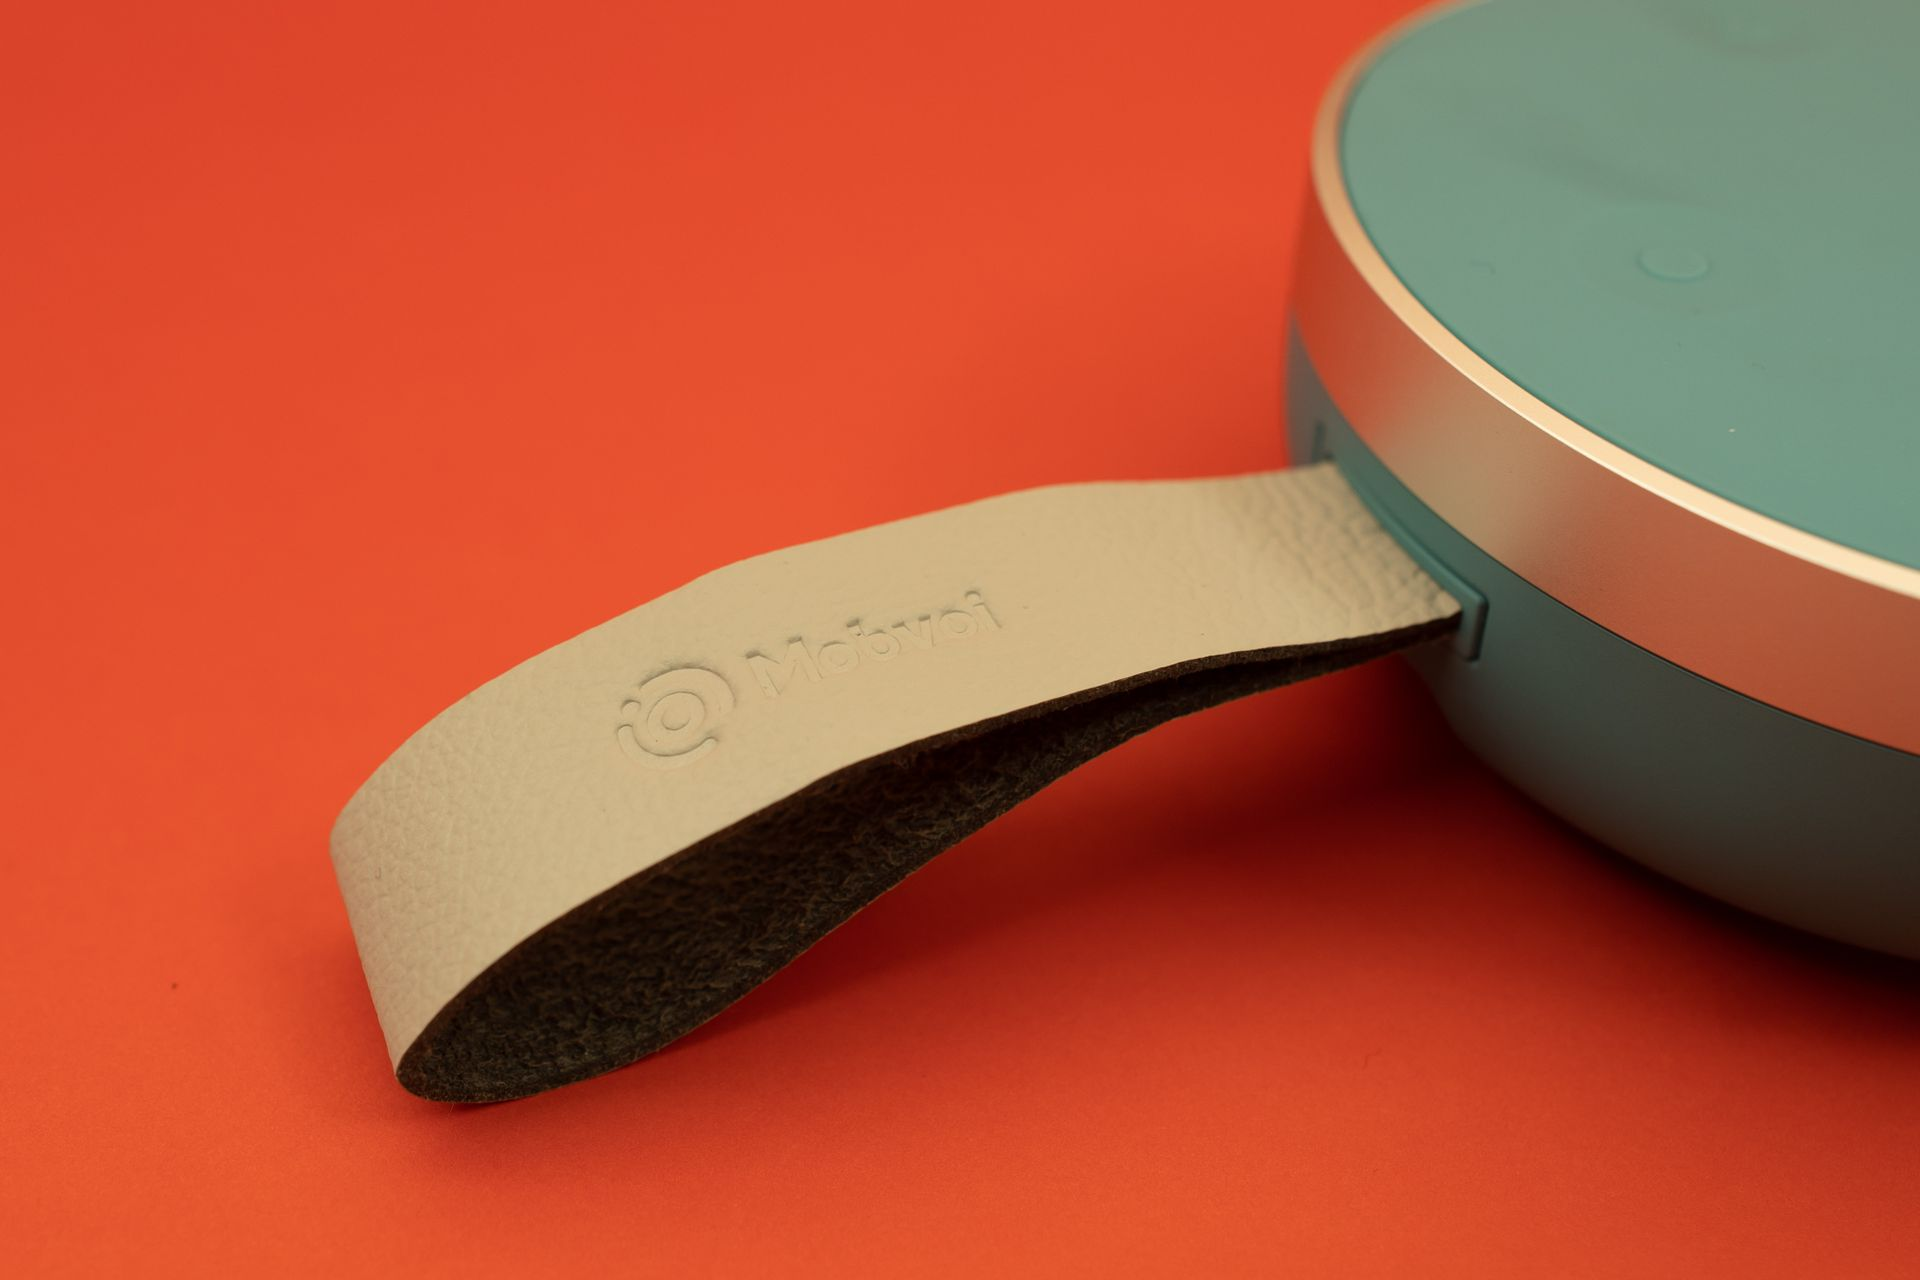 Tichome Mini To Chińska Alternatywa Dla Google Home Mini Rootblog